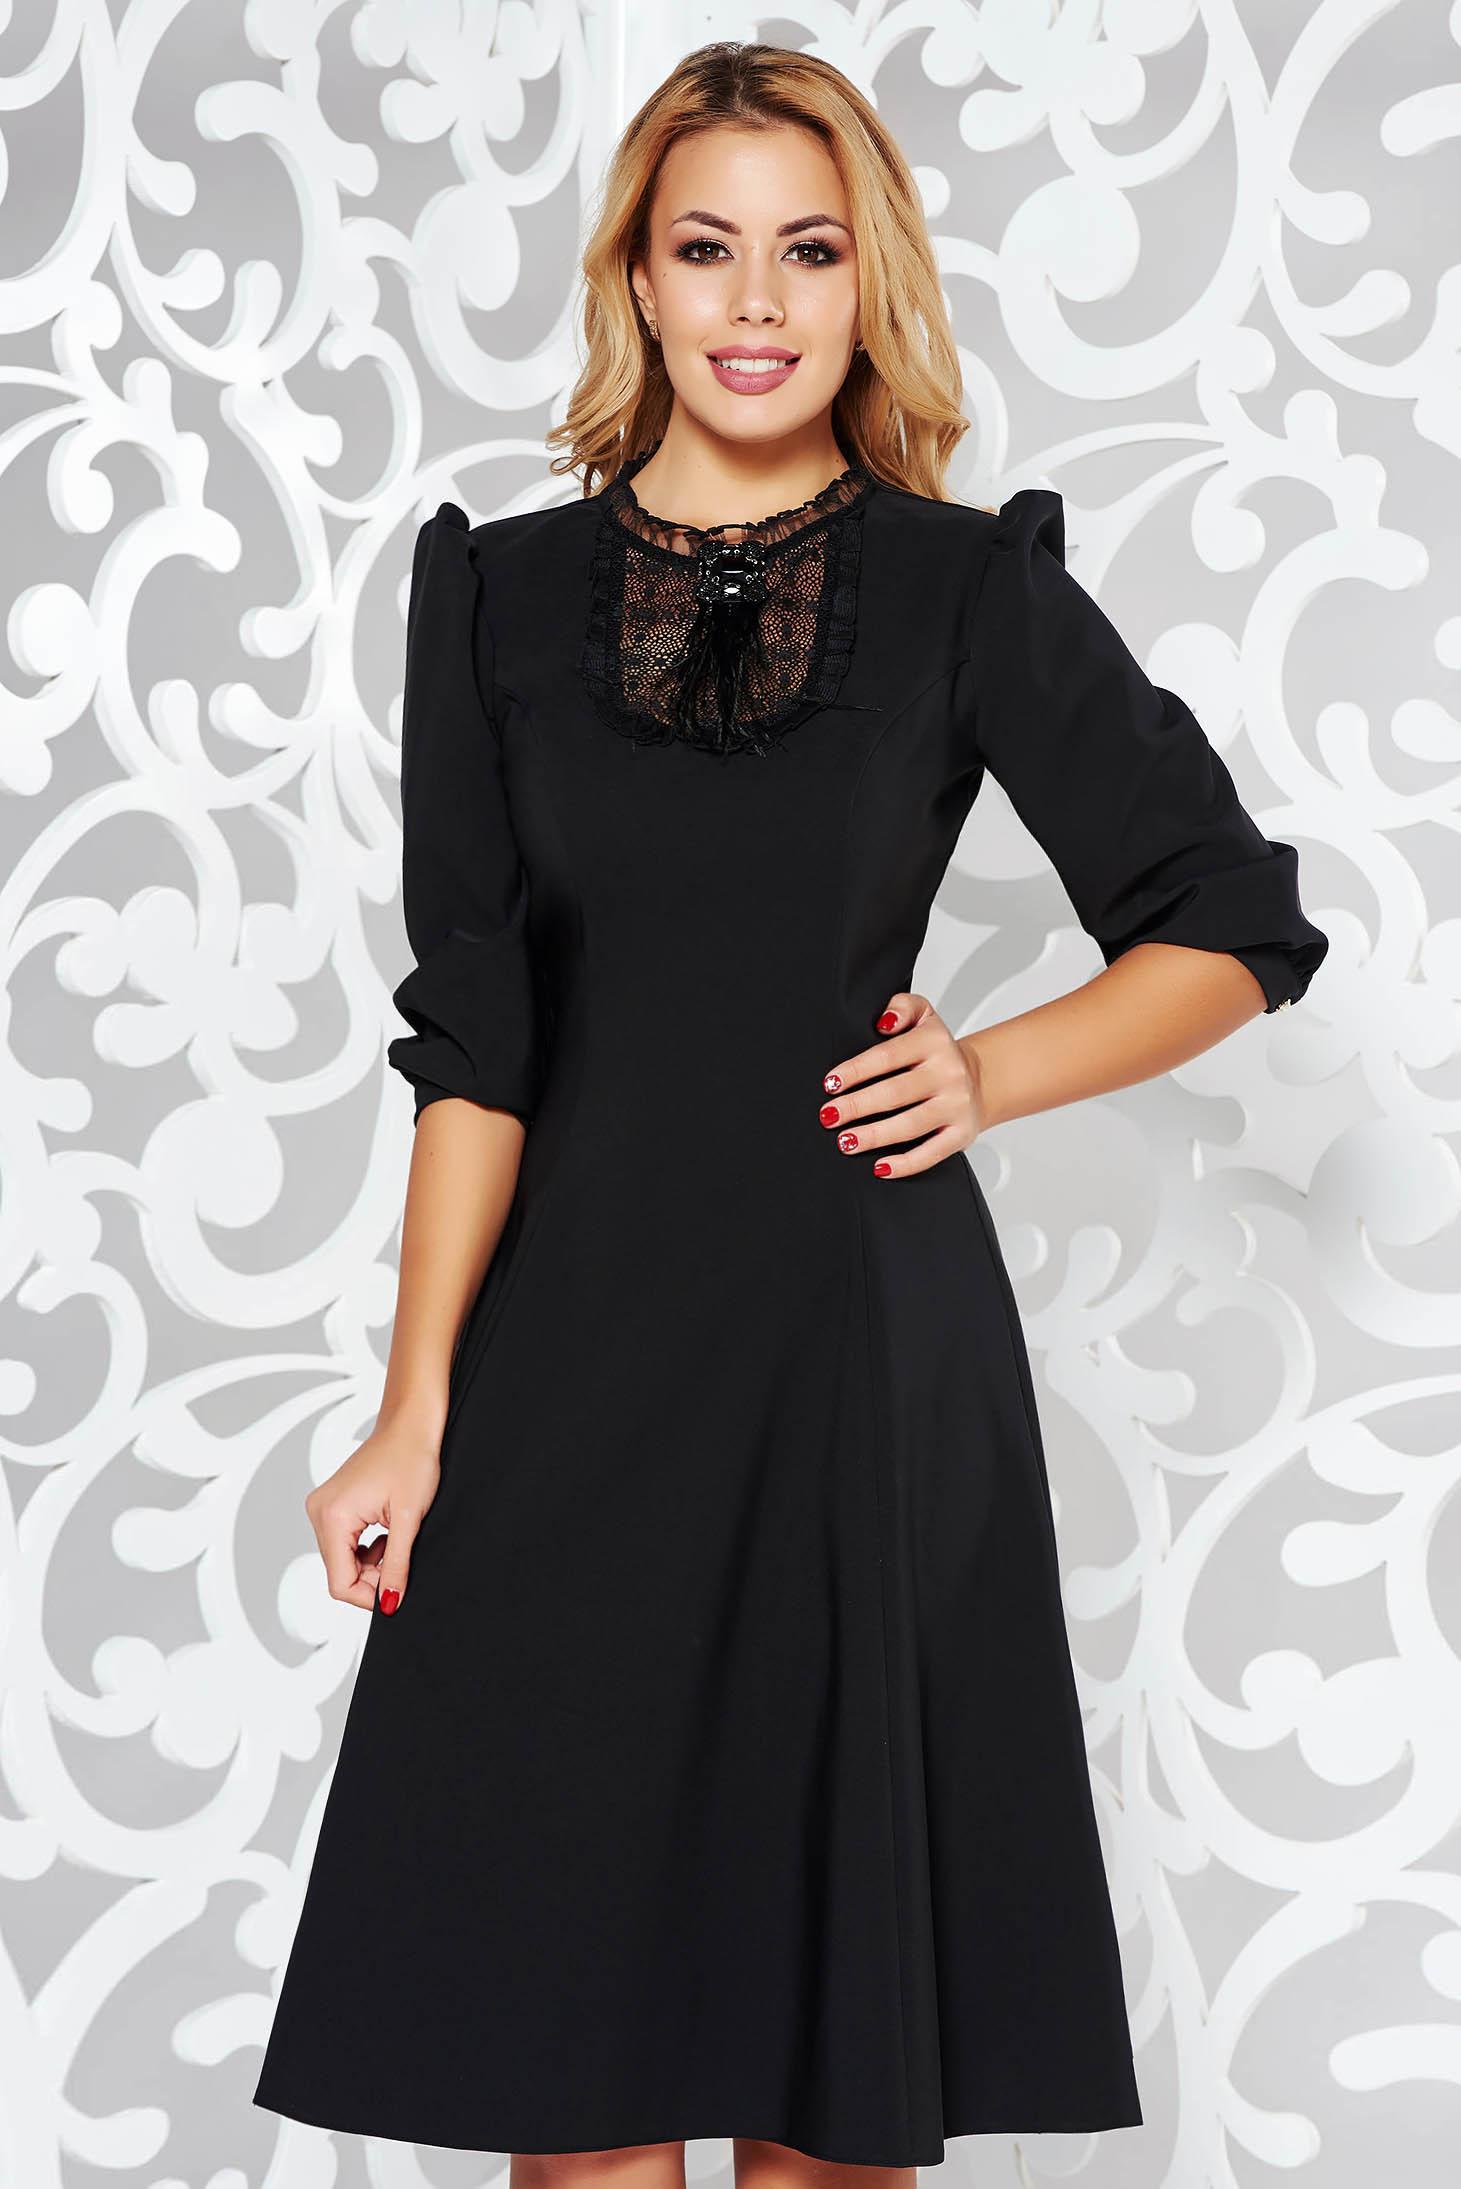 ladonna black elegant cloche dress slightly elastic fabric with lace